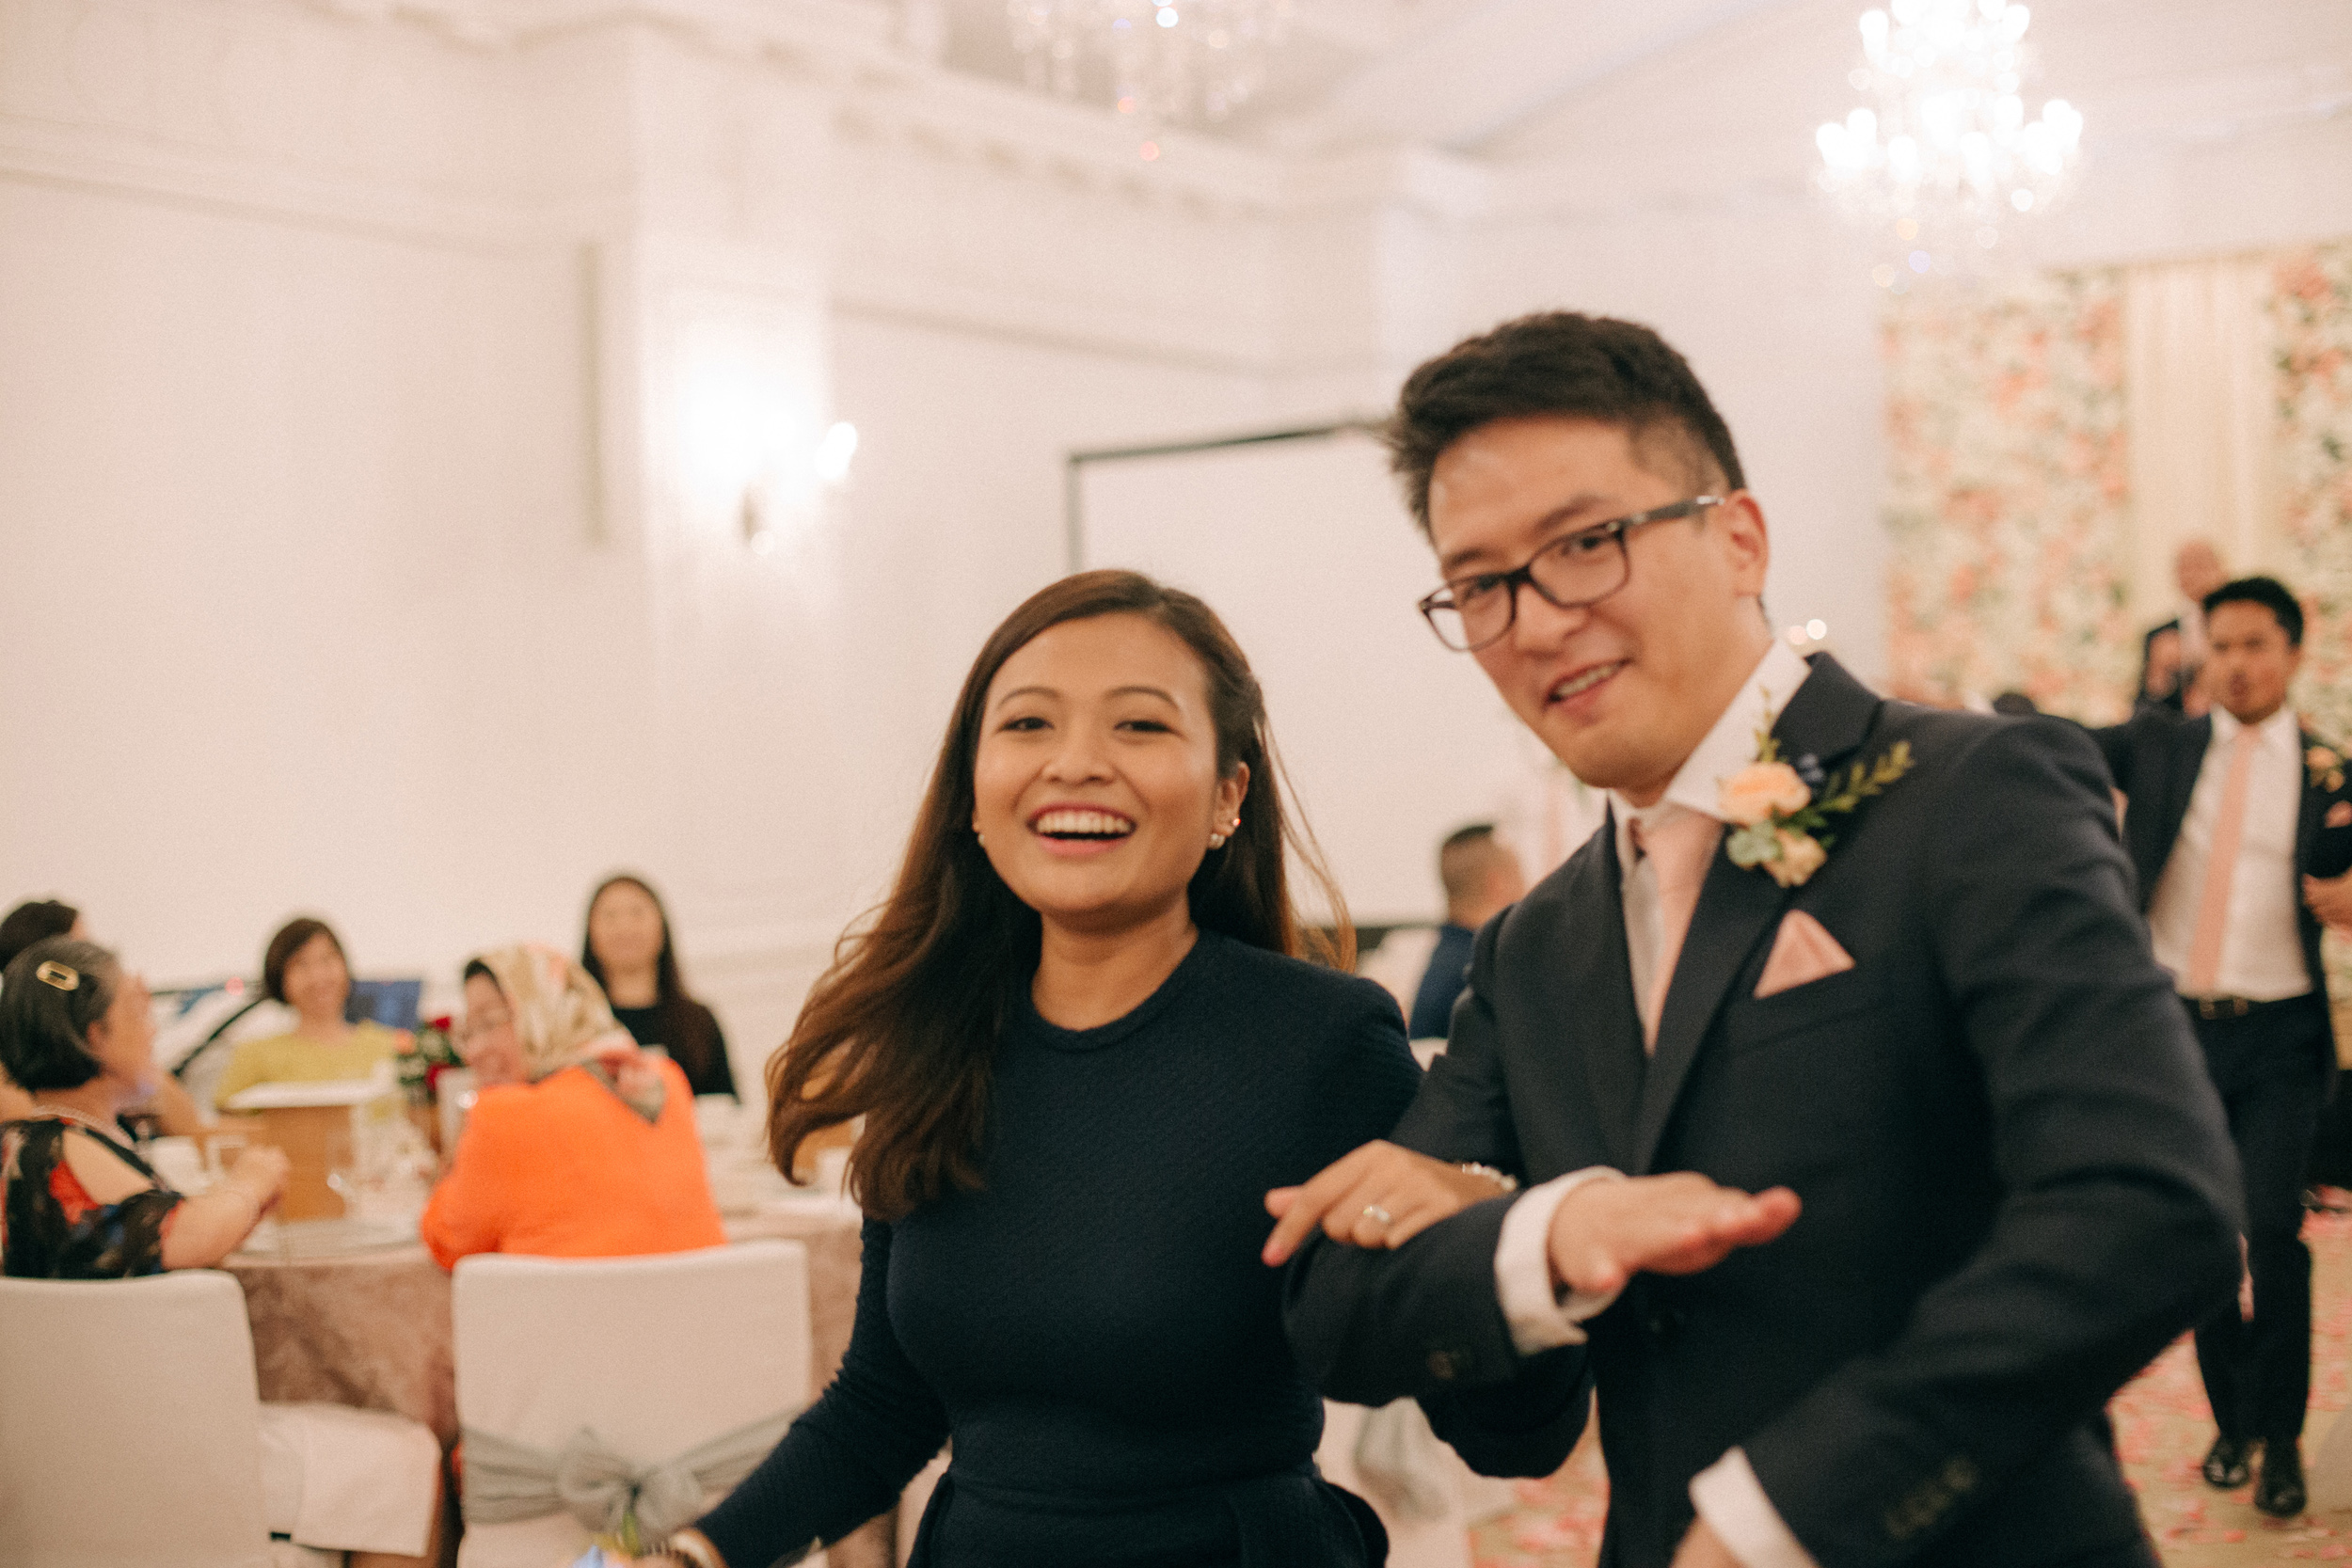 singapore-wedding-photographer-cheryl-matthew-fullerton-hotel-wedding-86.jpg